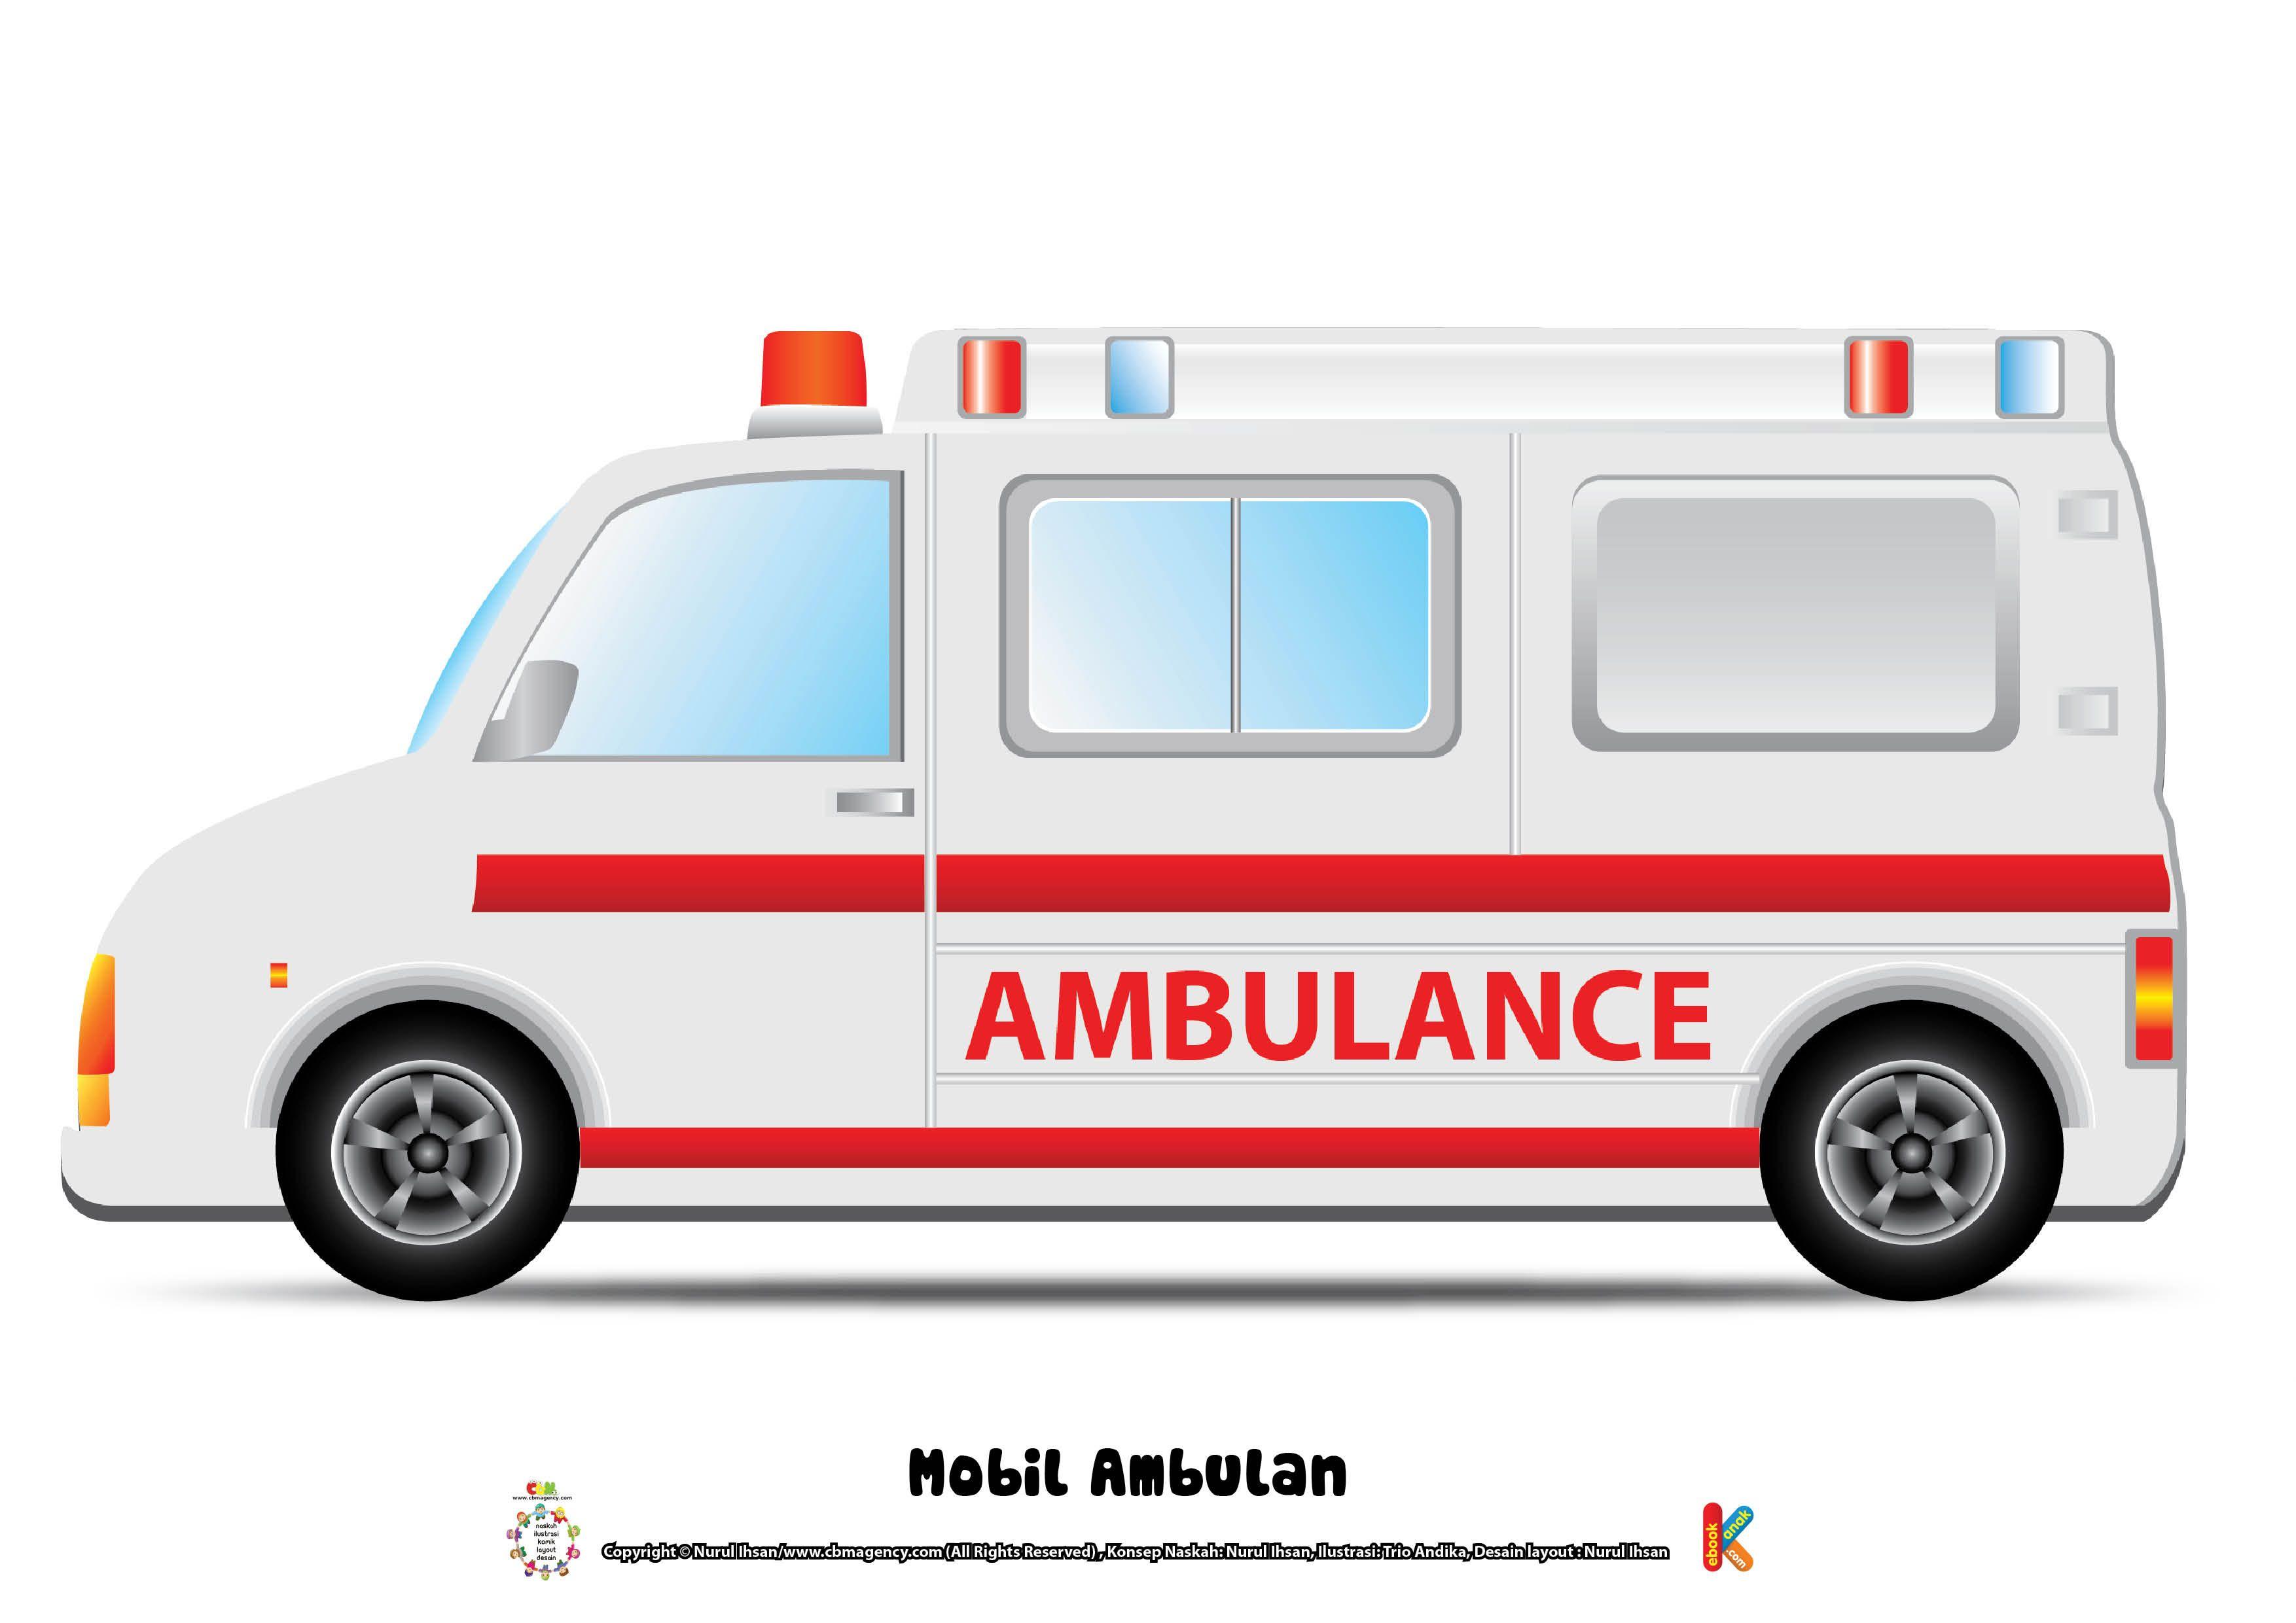 Kapan Mobil Ambulans Pertamakali Dikenal Ambulans Mobil Transportasi Darat